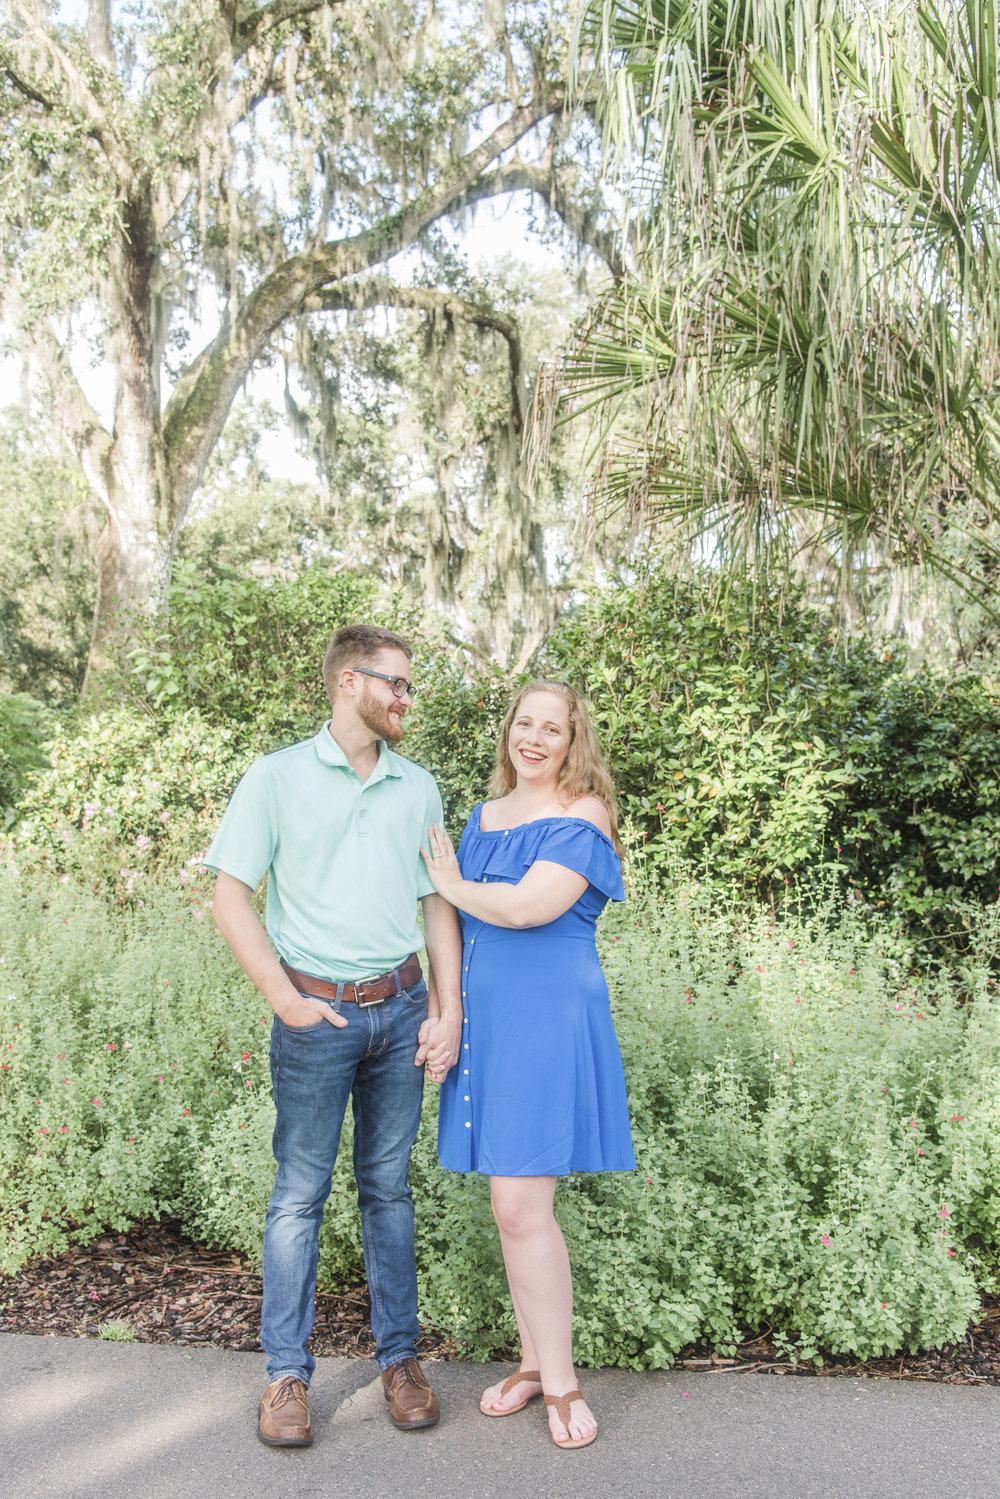 AmandaAndMatt_Engaged-18-copyjpg